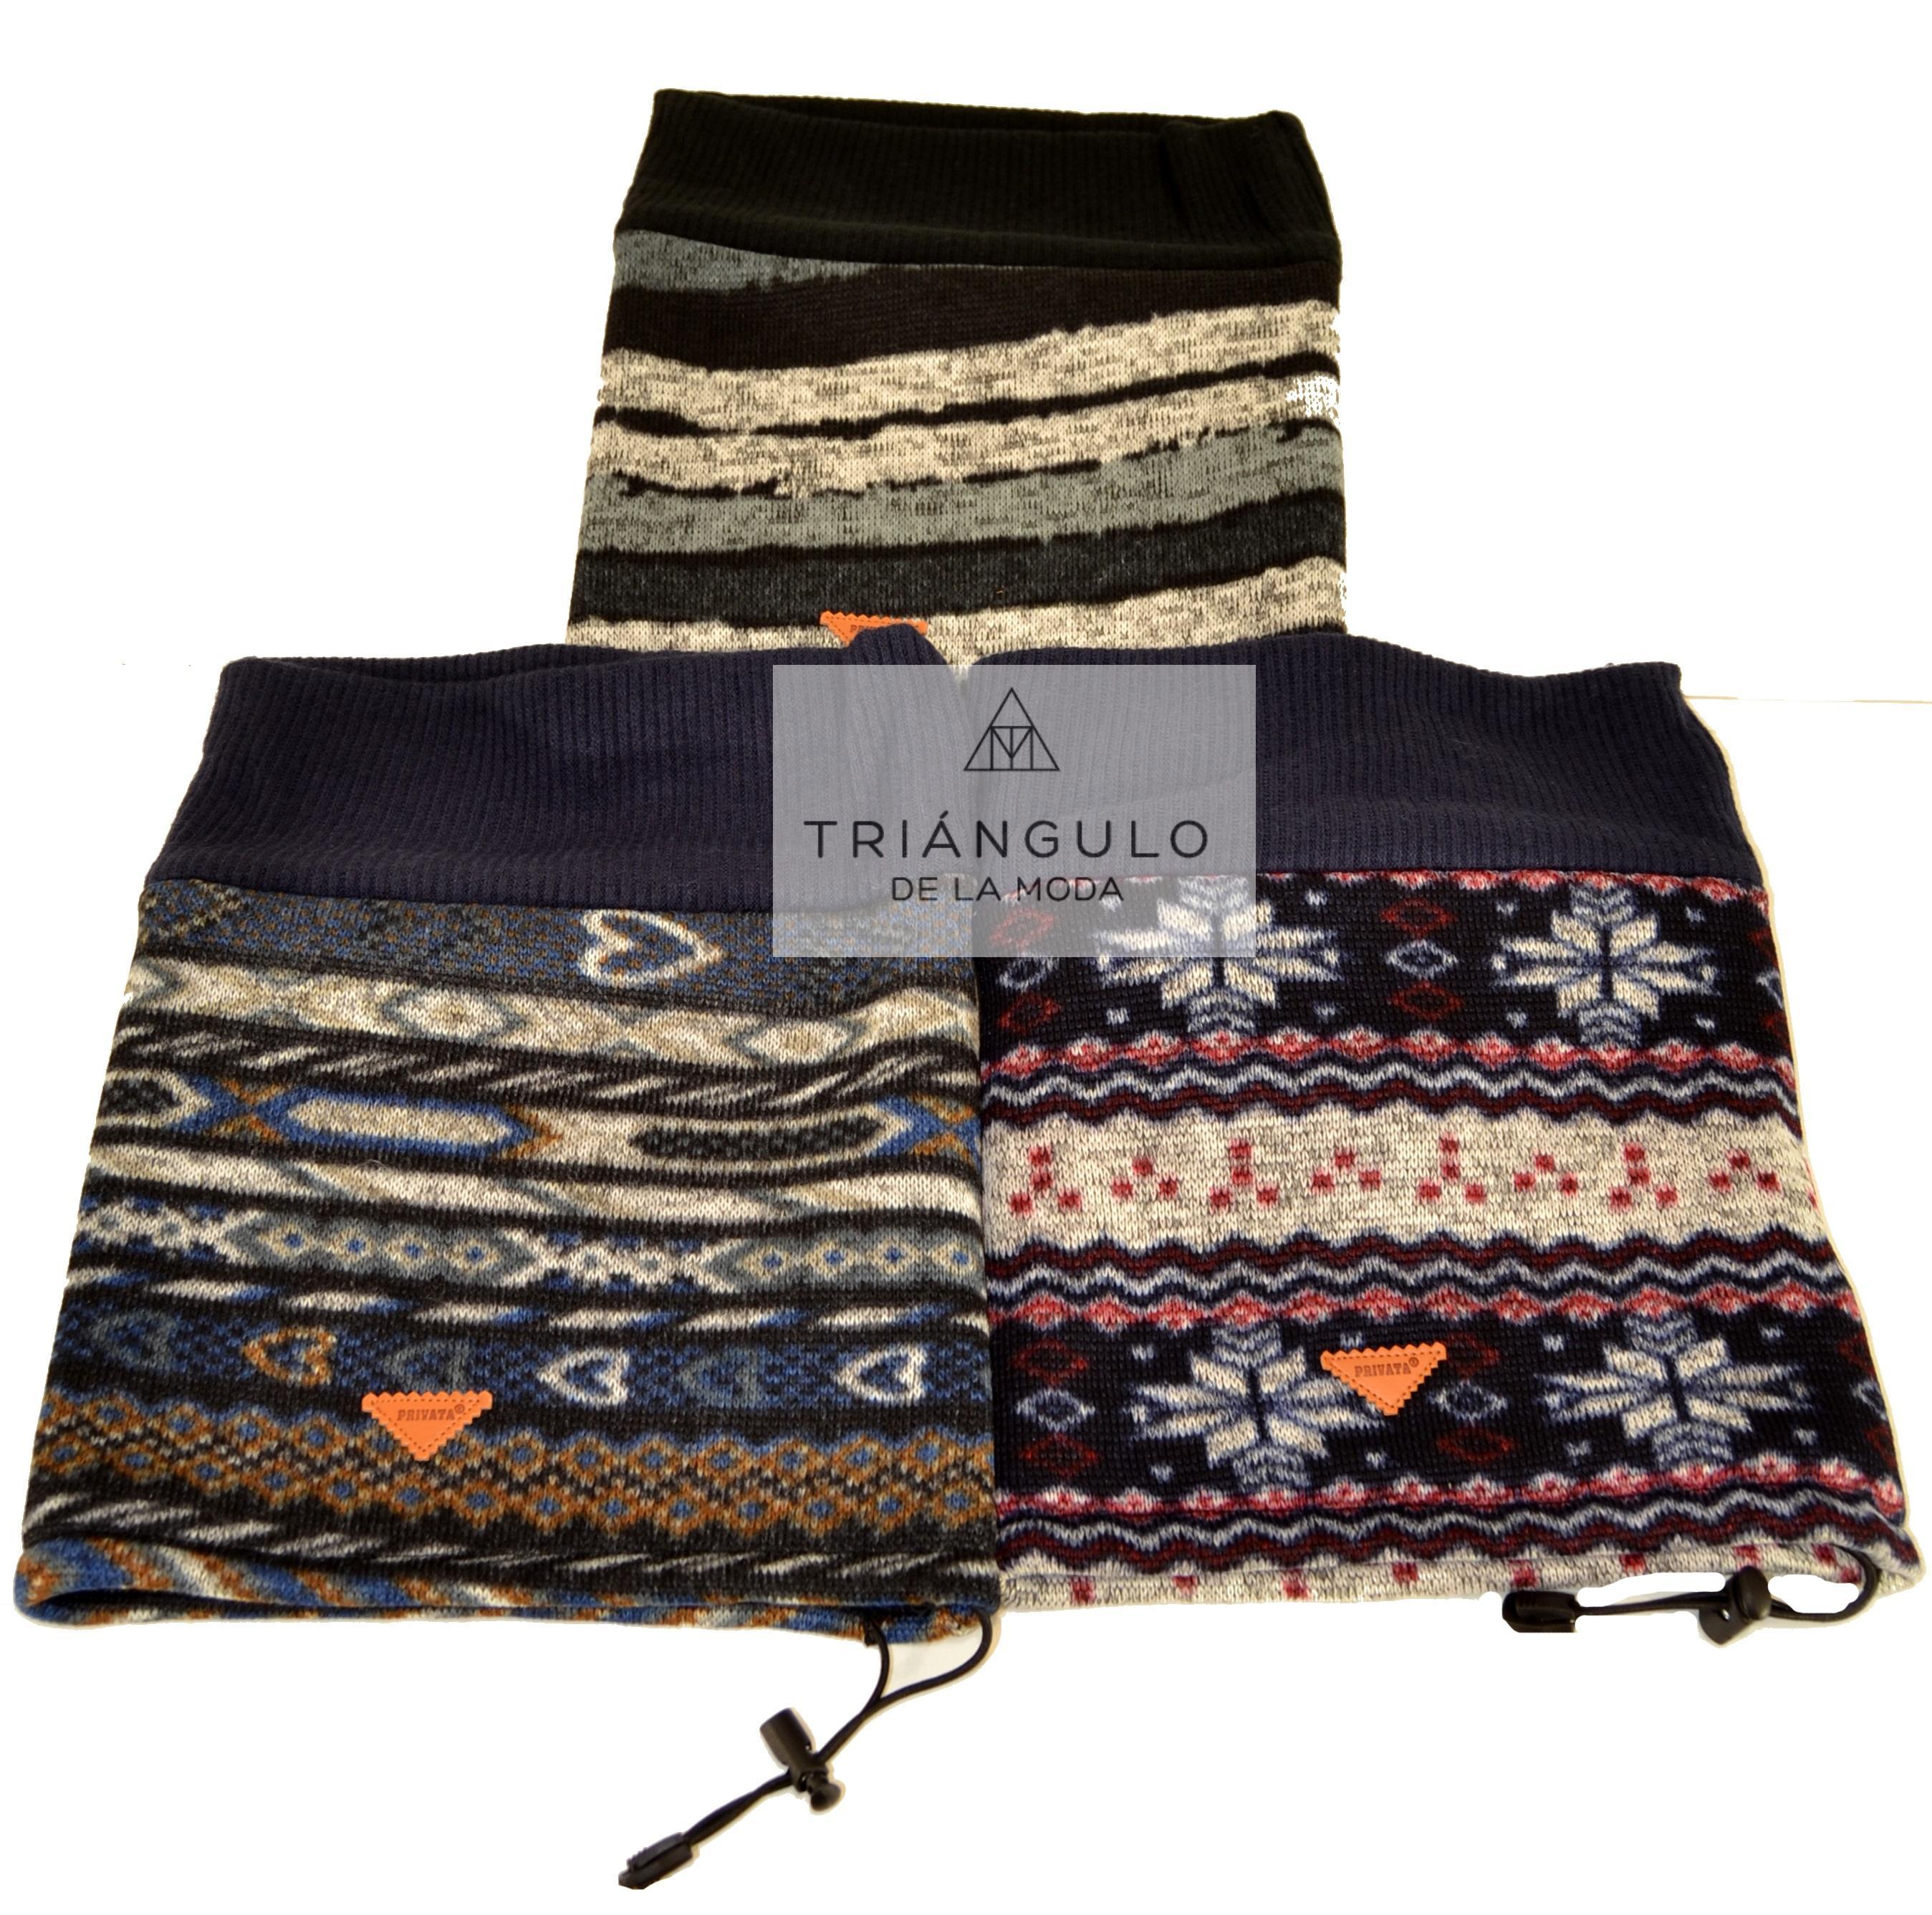 Tienda online del Triangulo de la Moda CUELLO